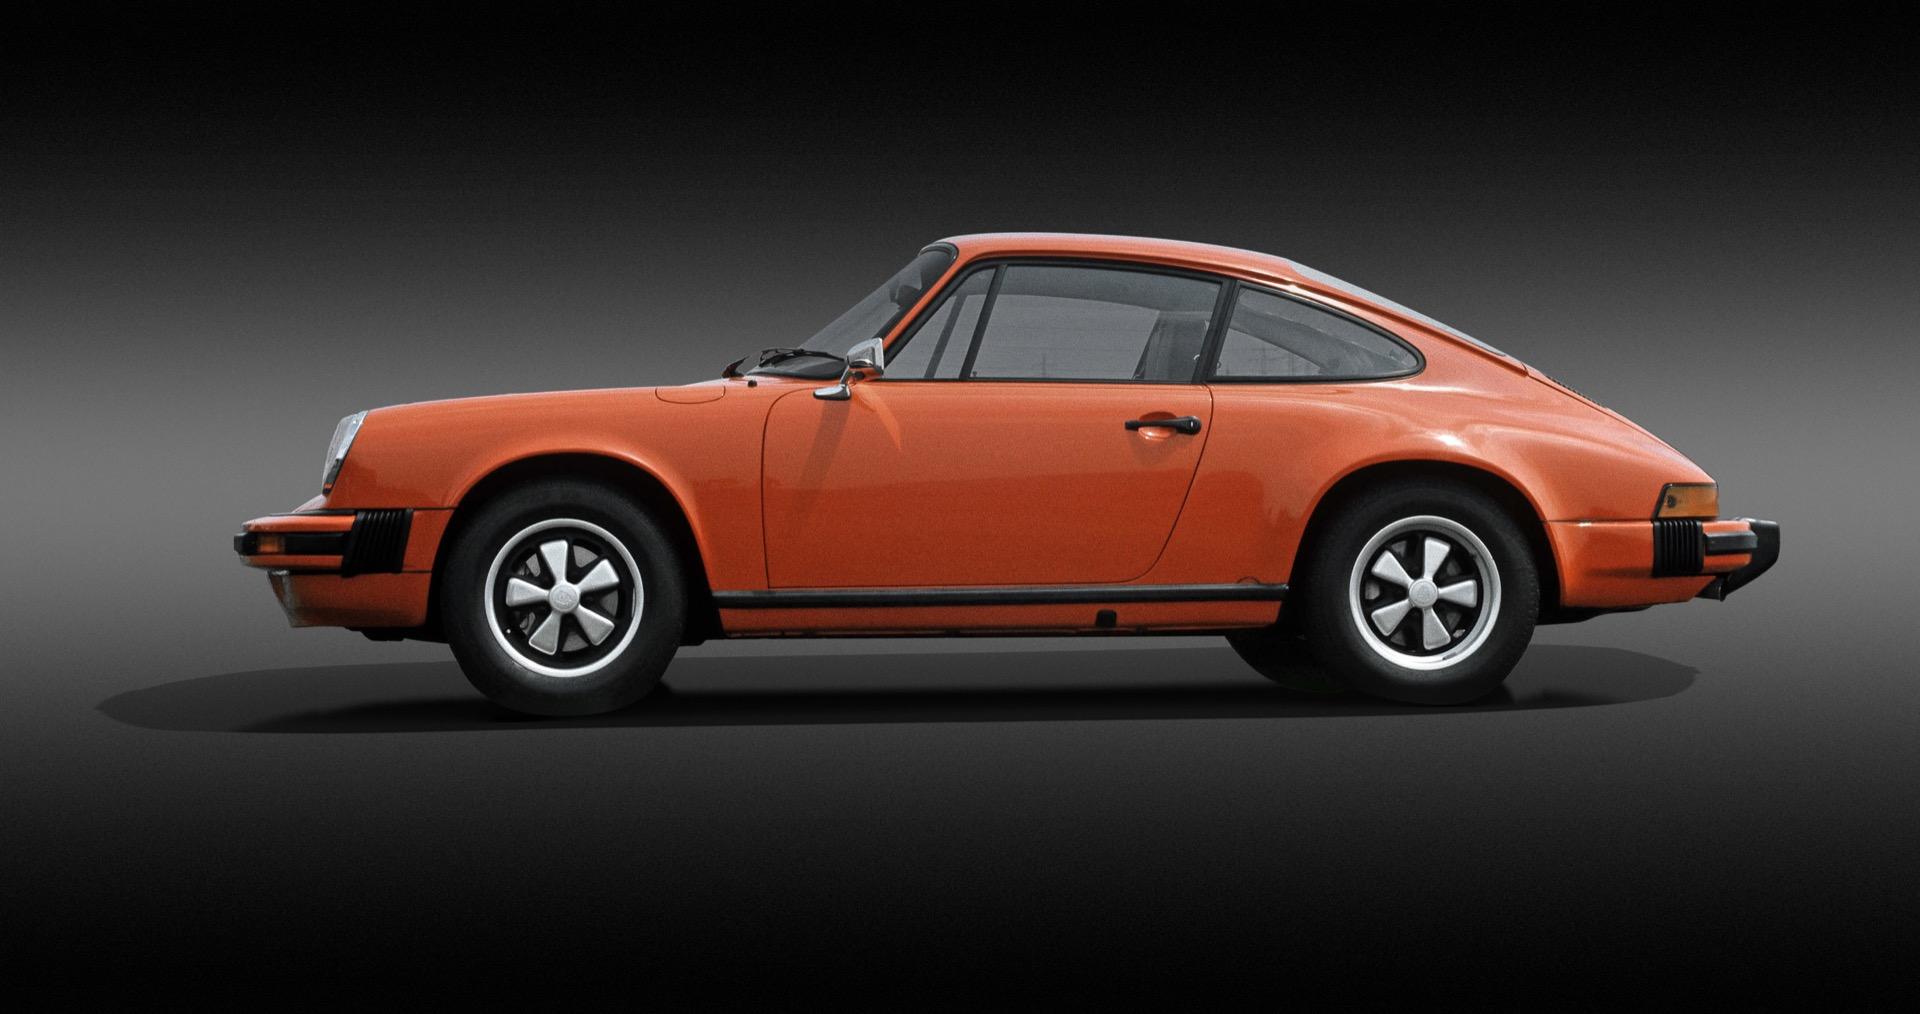 1974, 911 Carrera Coupé, G Serie, 2,7 Liter, Generationen